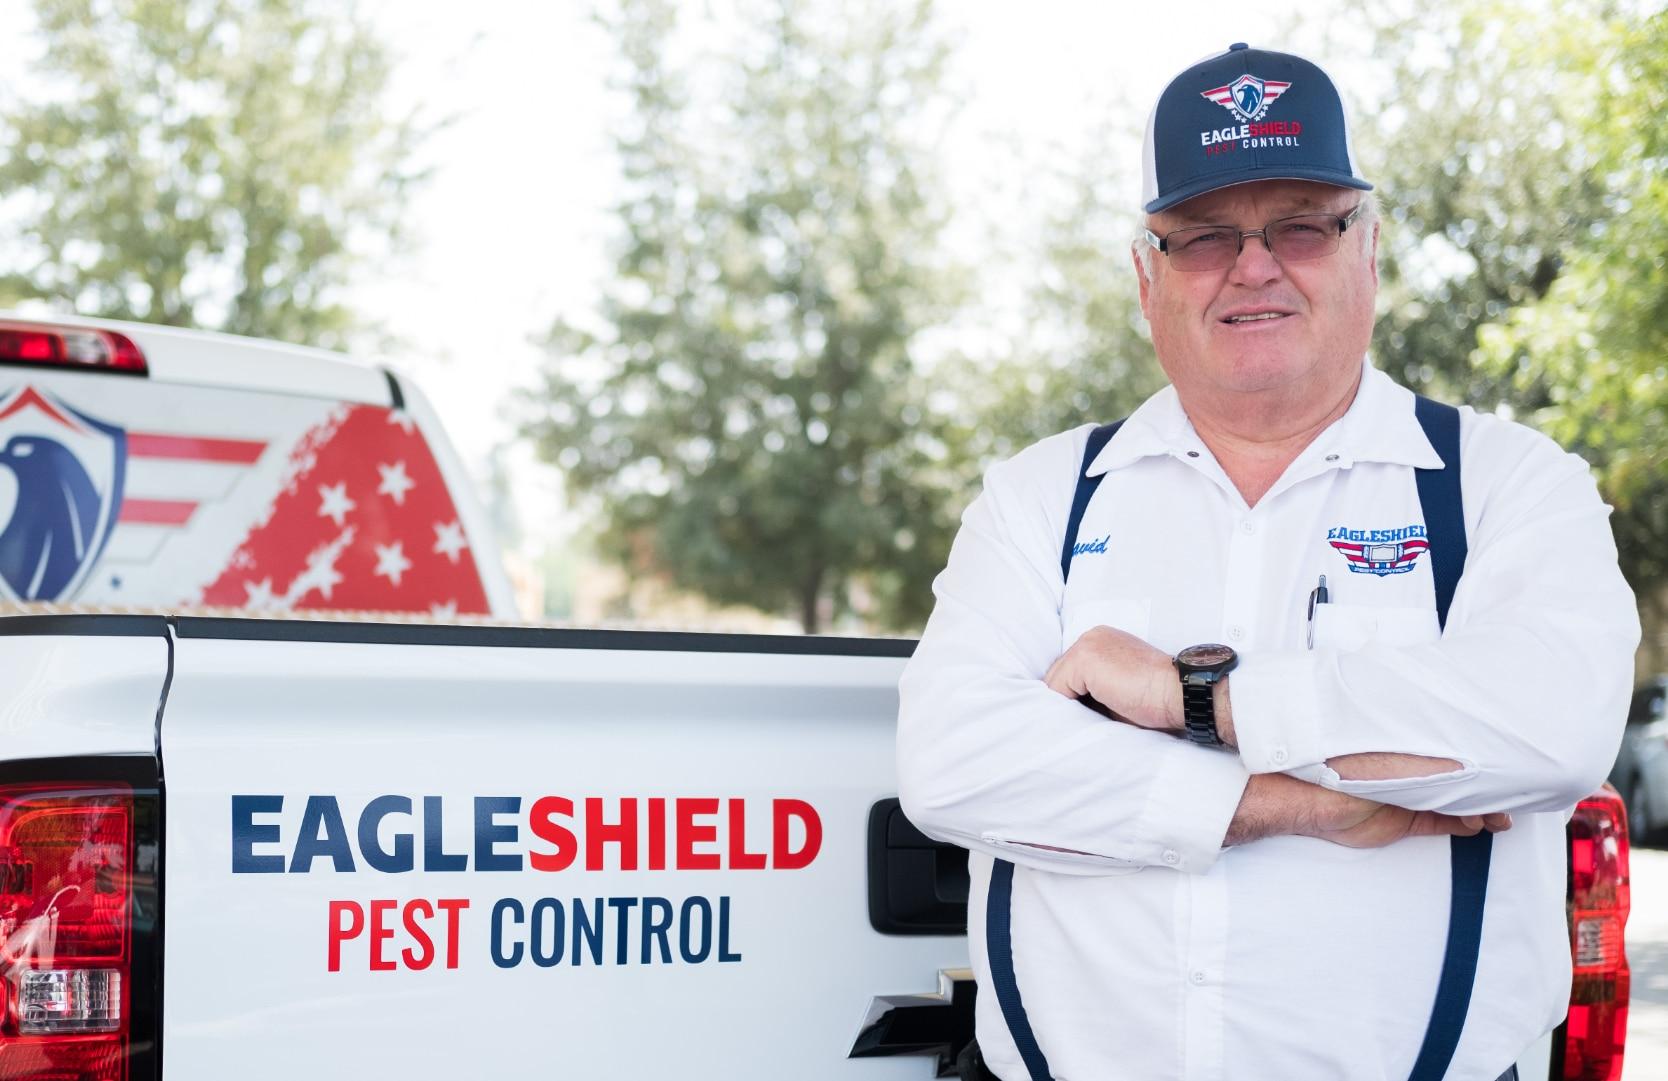 david web paso robles pest eagleshield